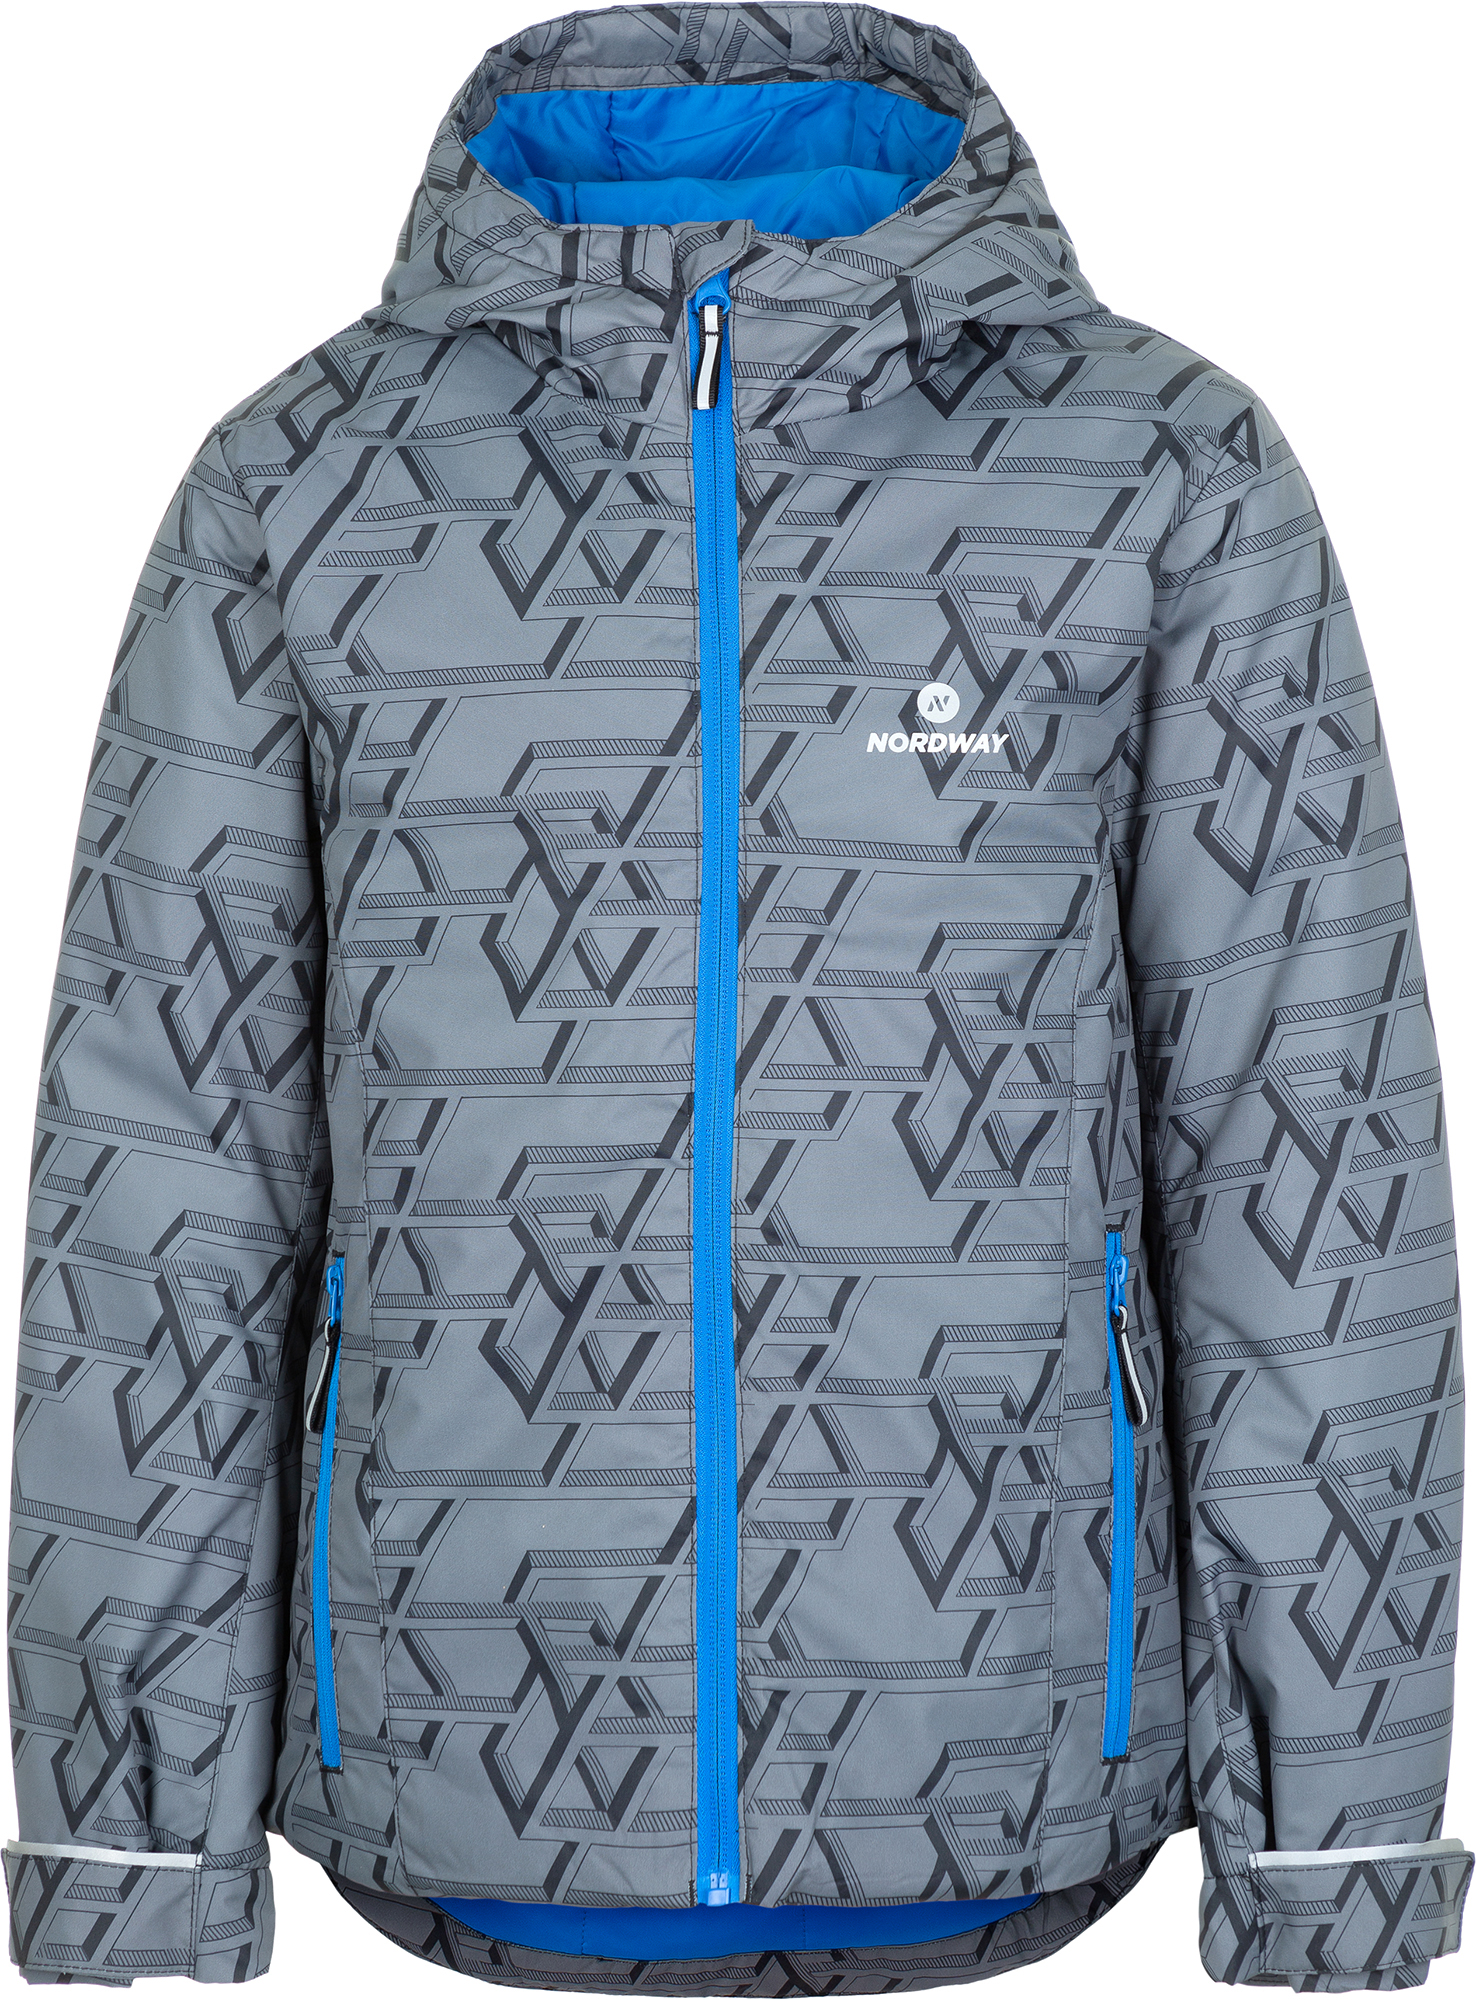 Nordway Куртка для мальчиков Nordway, размер 128